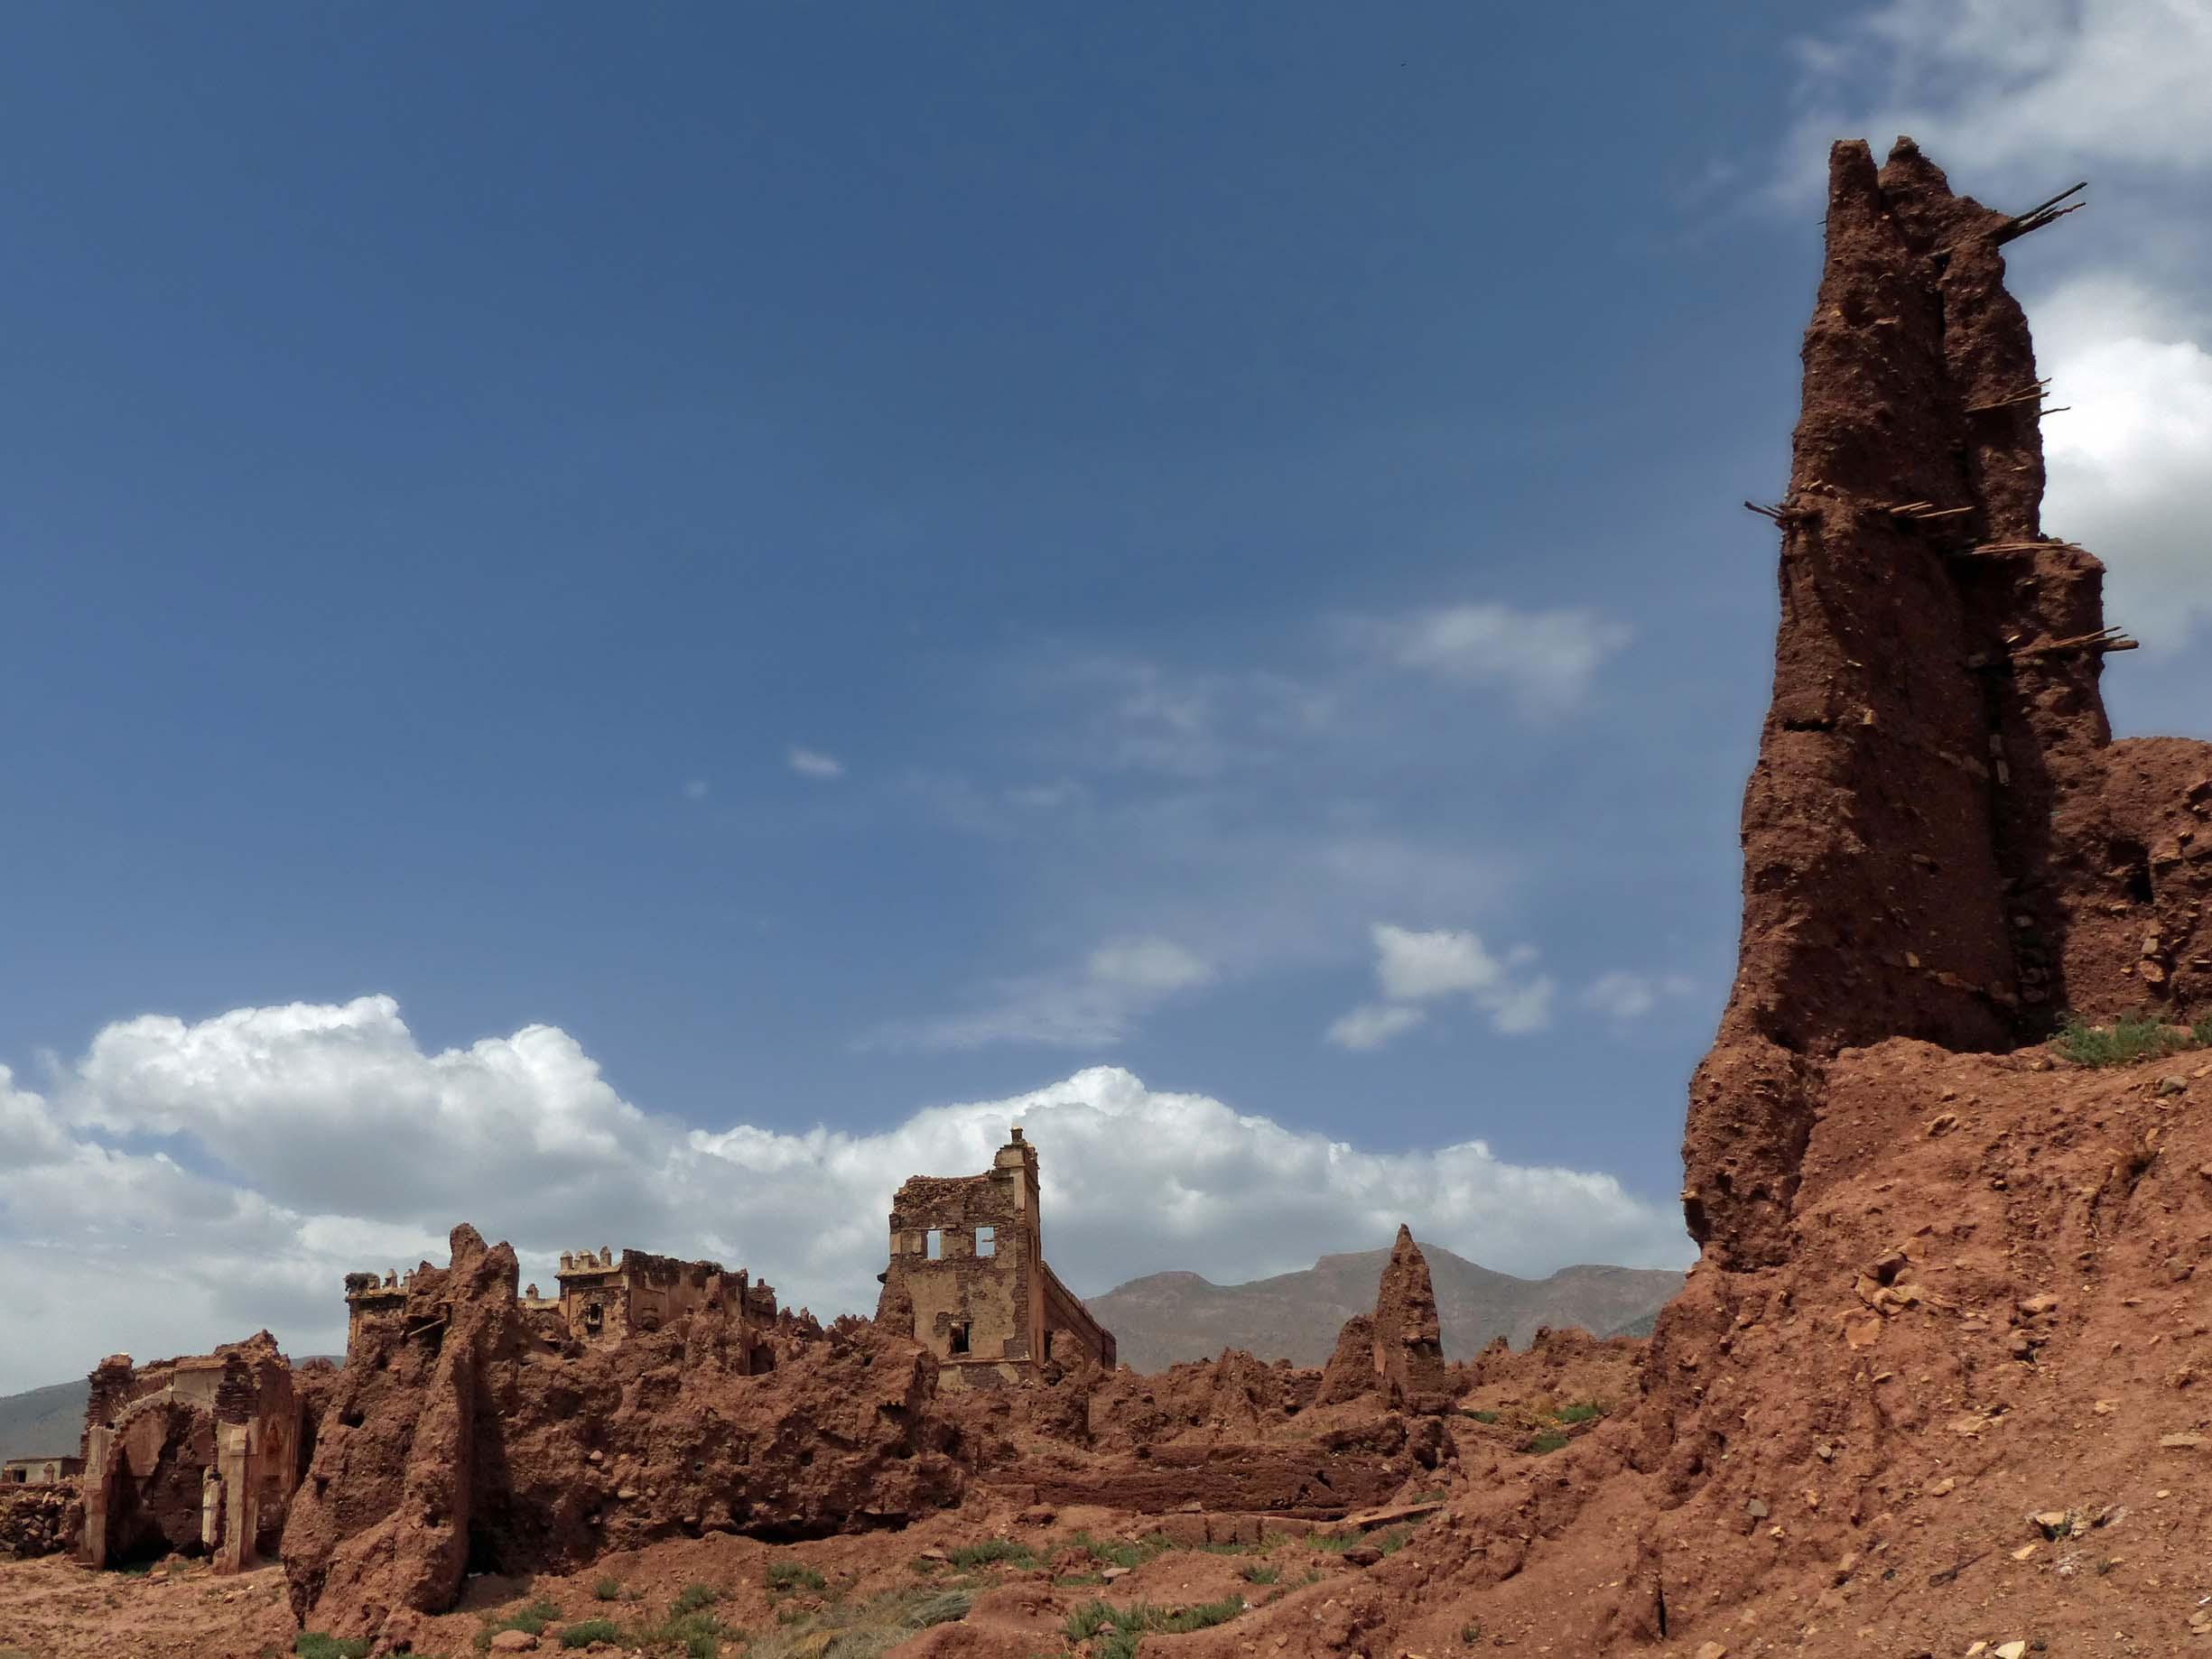 Red crumbling ruins